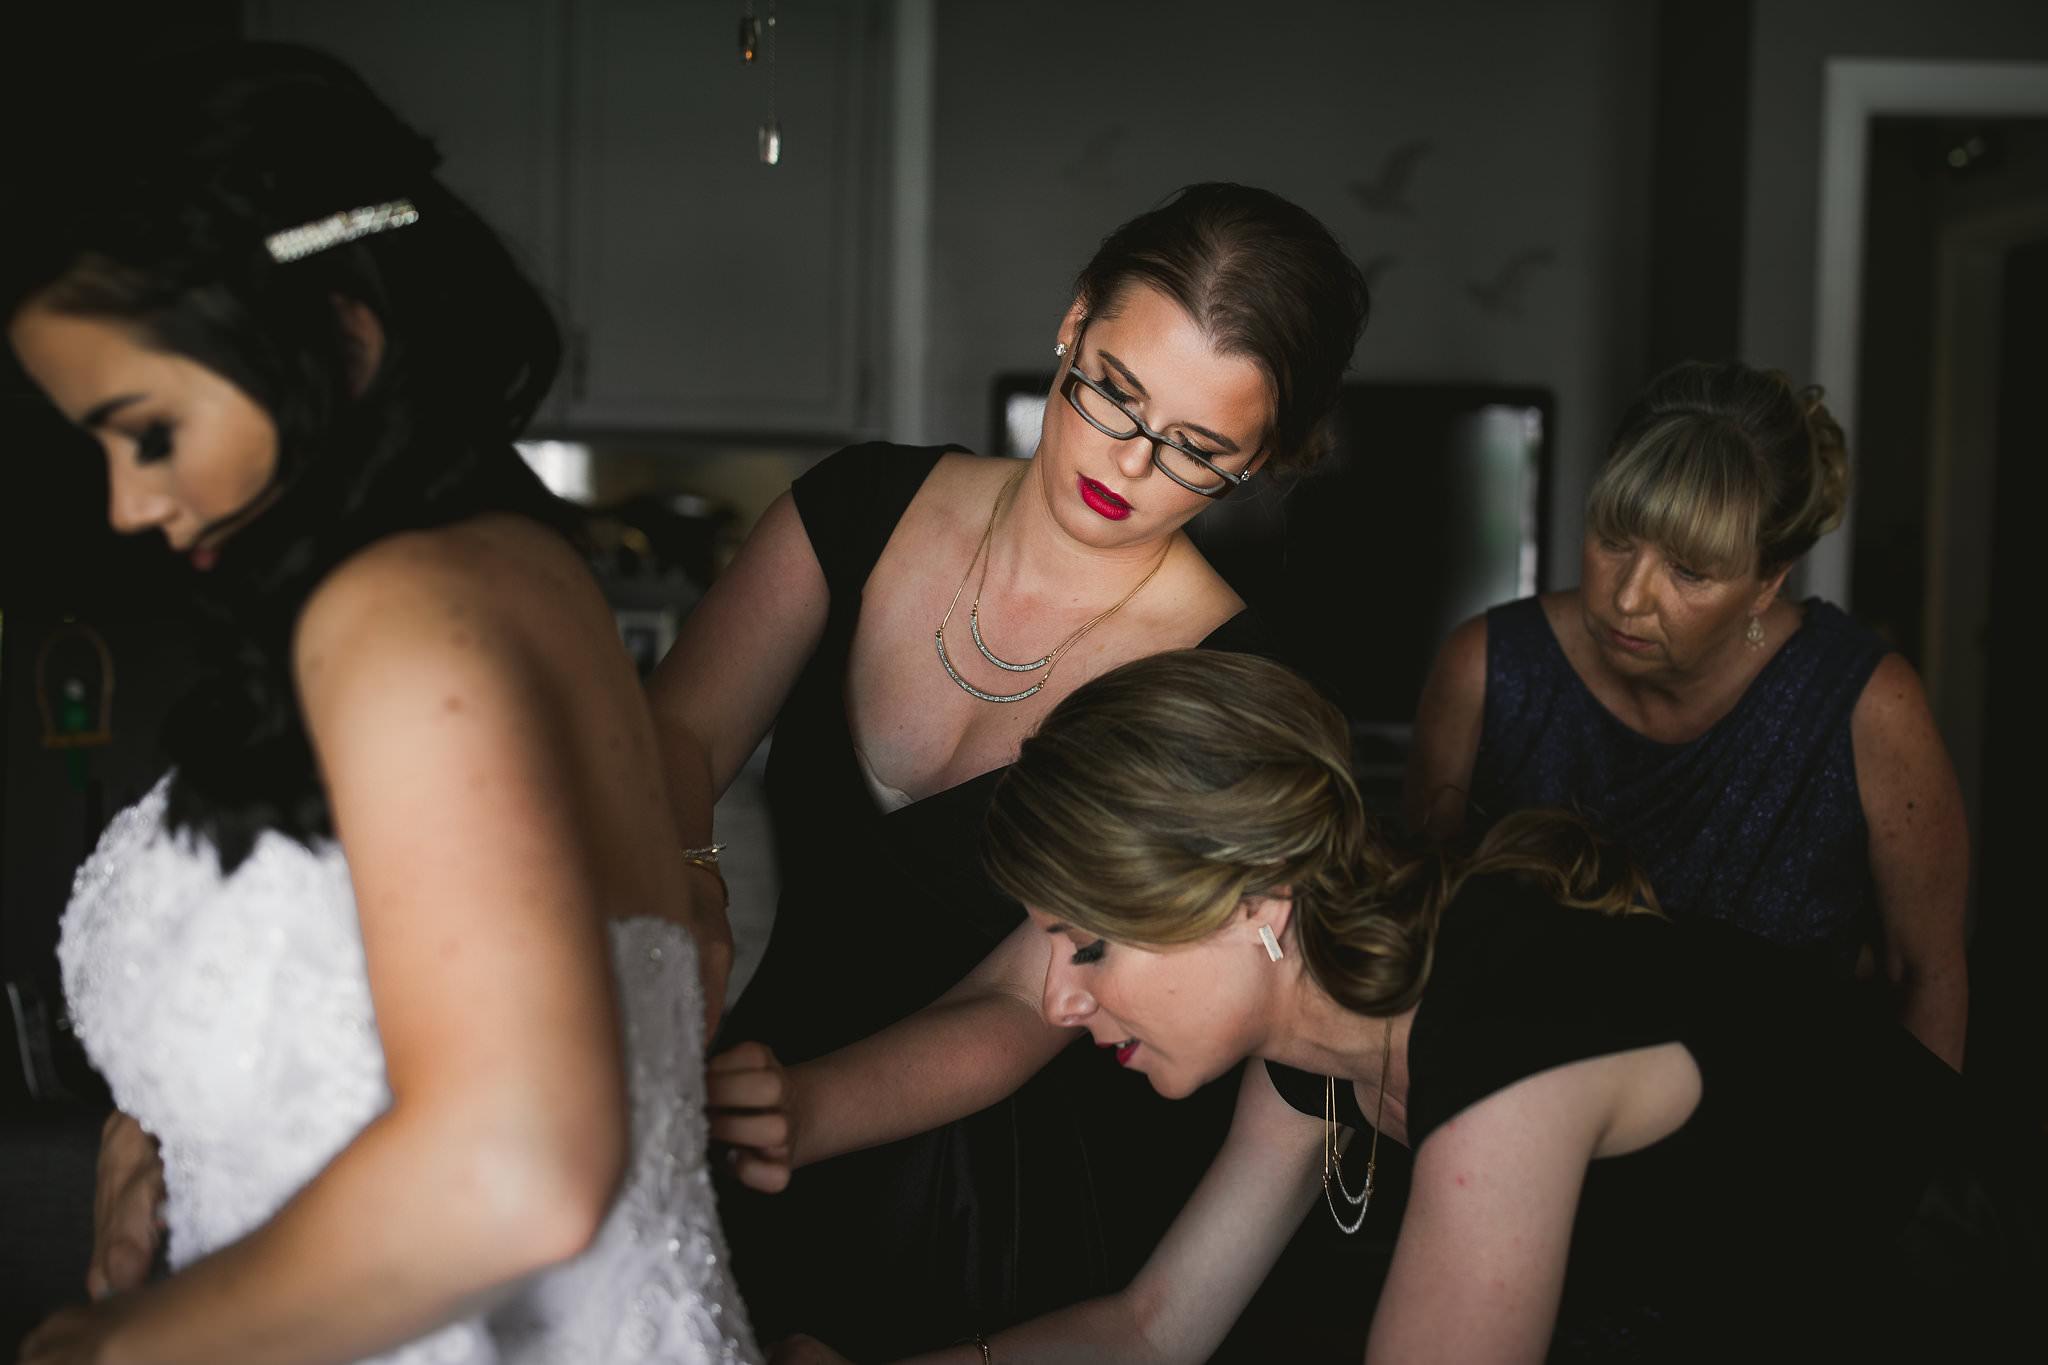 Kristen Adam Kindred Loft Whitby Wedding Photos 46 - Durham Wedding Photographer: Kindred Loft Wedding Photos